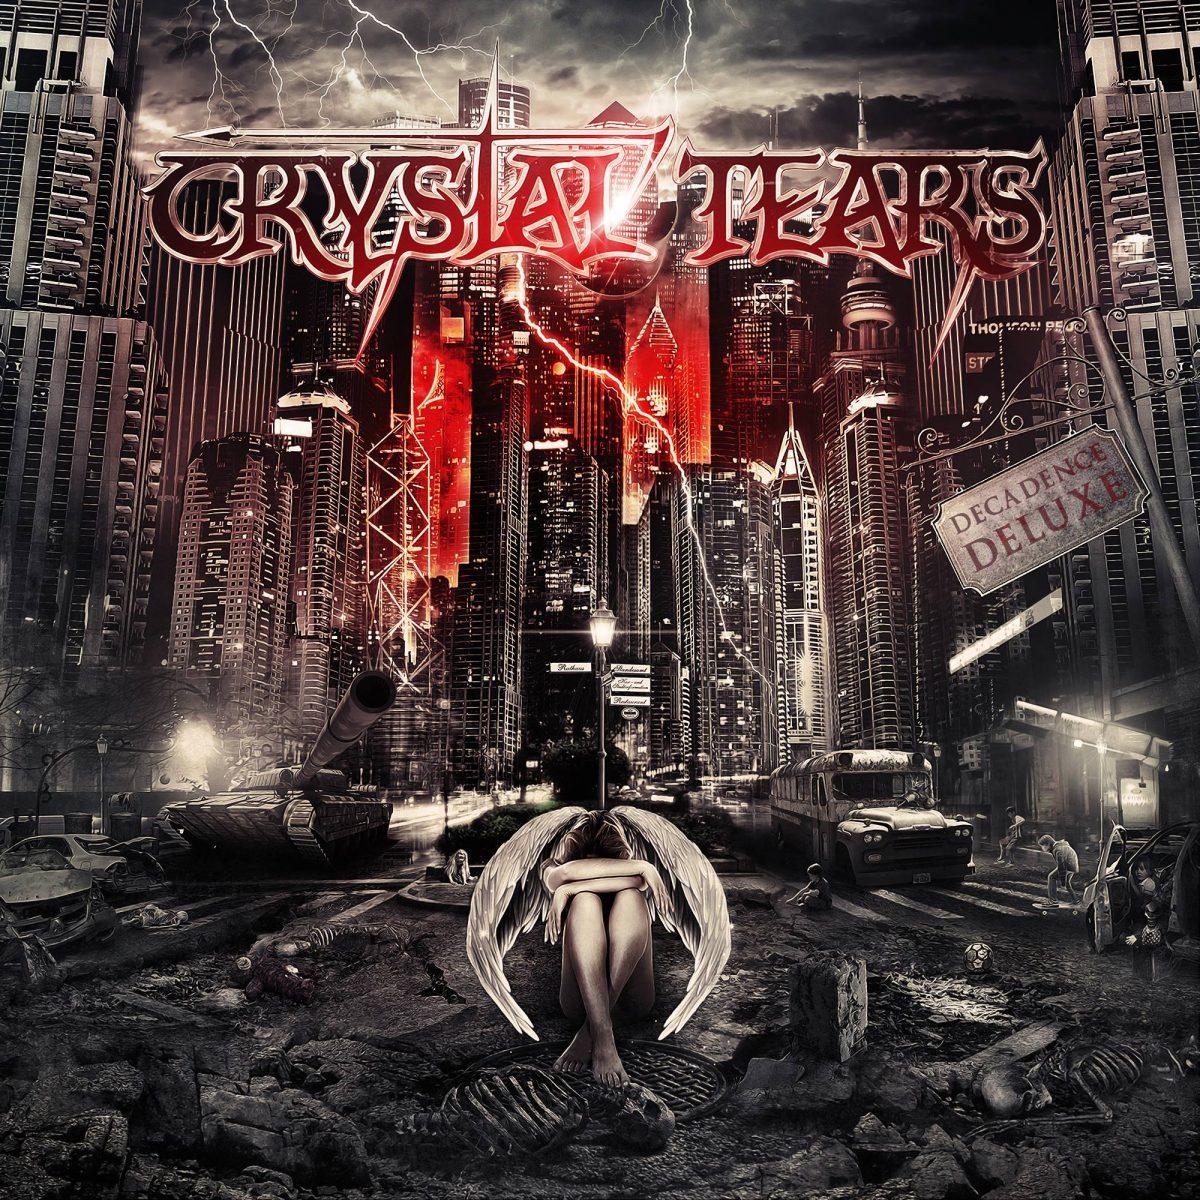 Crystal Tears - Decadence Deluxe